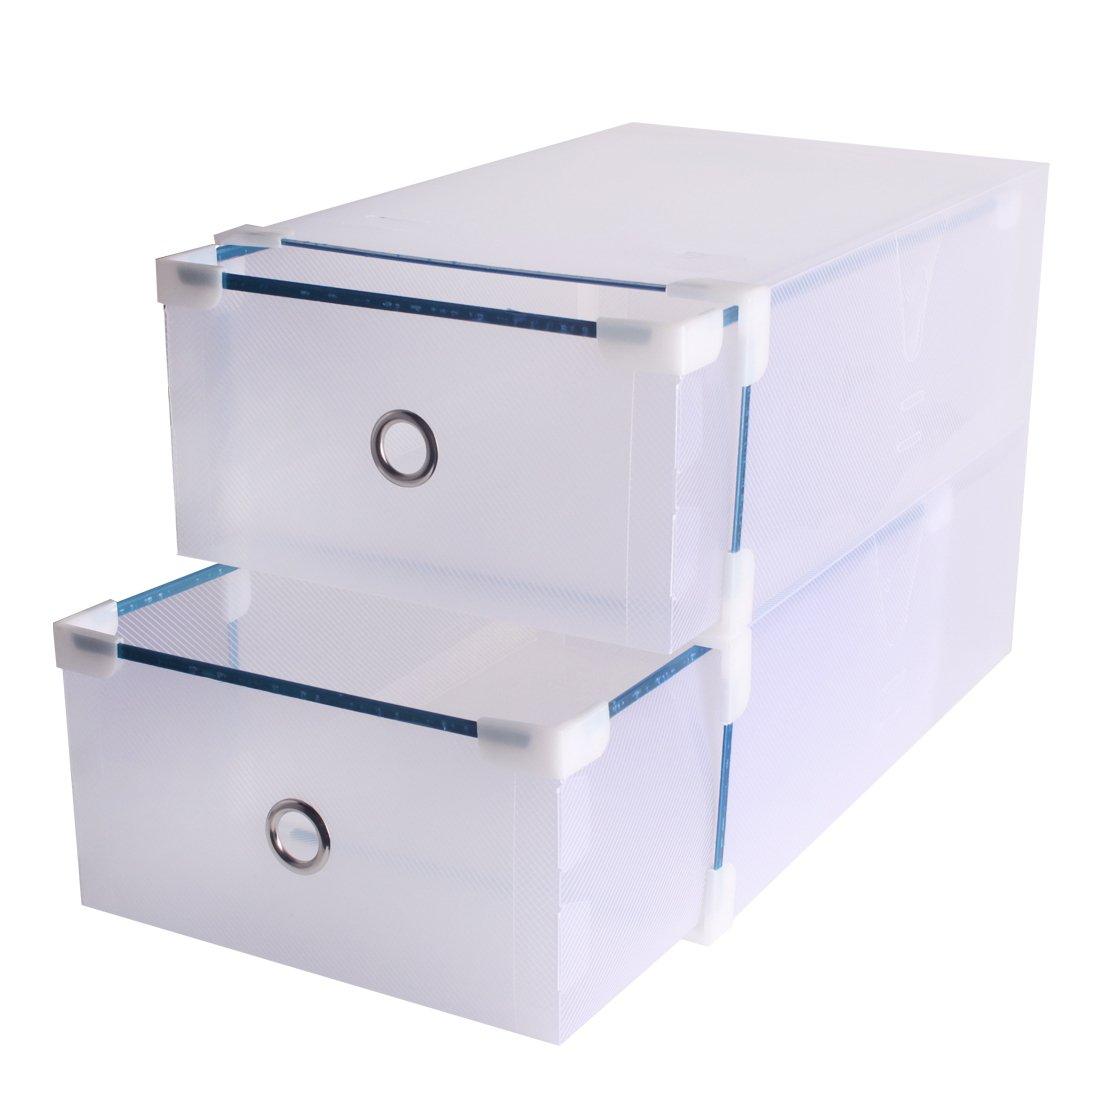 Loywe Schuhaufbewahrung Schuh Box Schuhe Schuhbox Schuhkasten Schuhkarton 5 St LWA190-5X